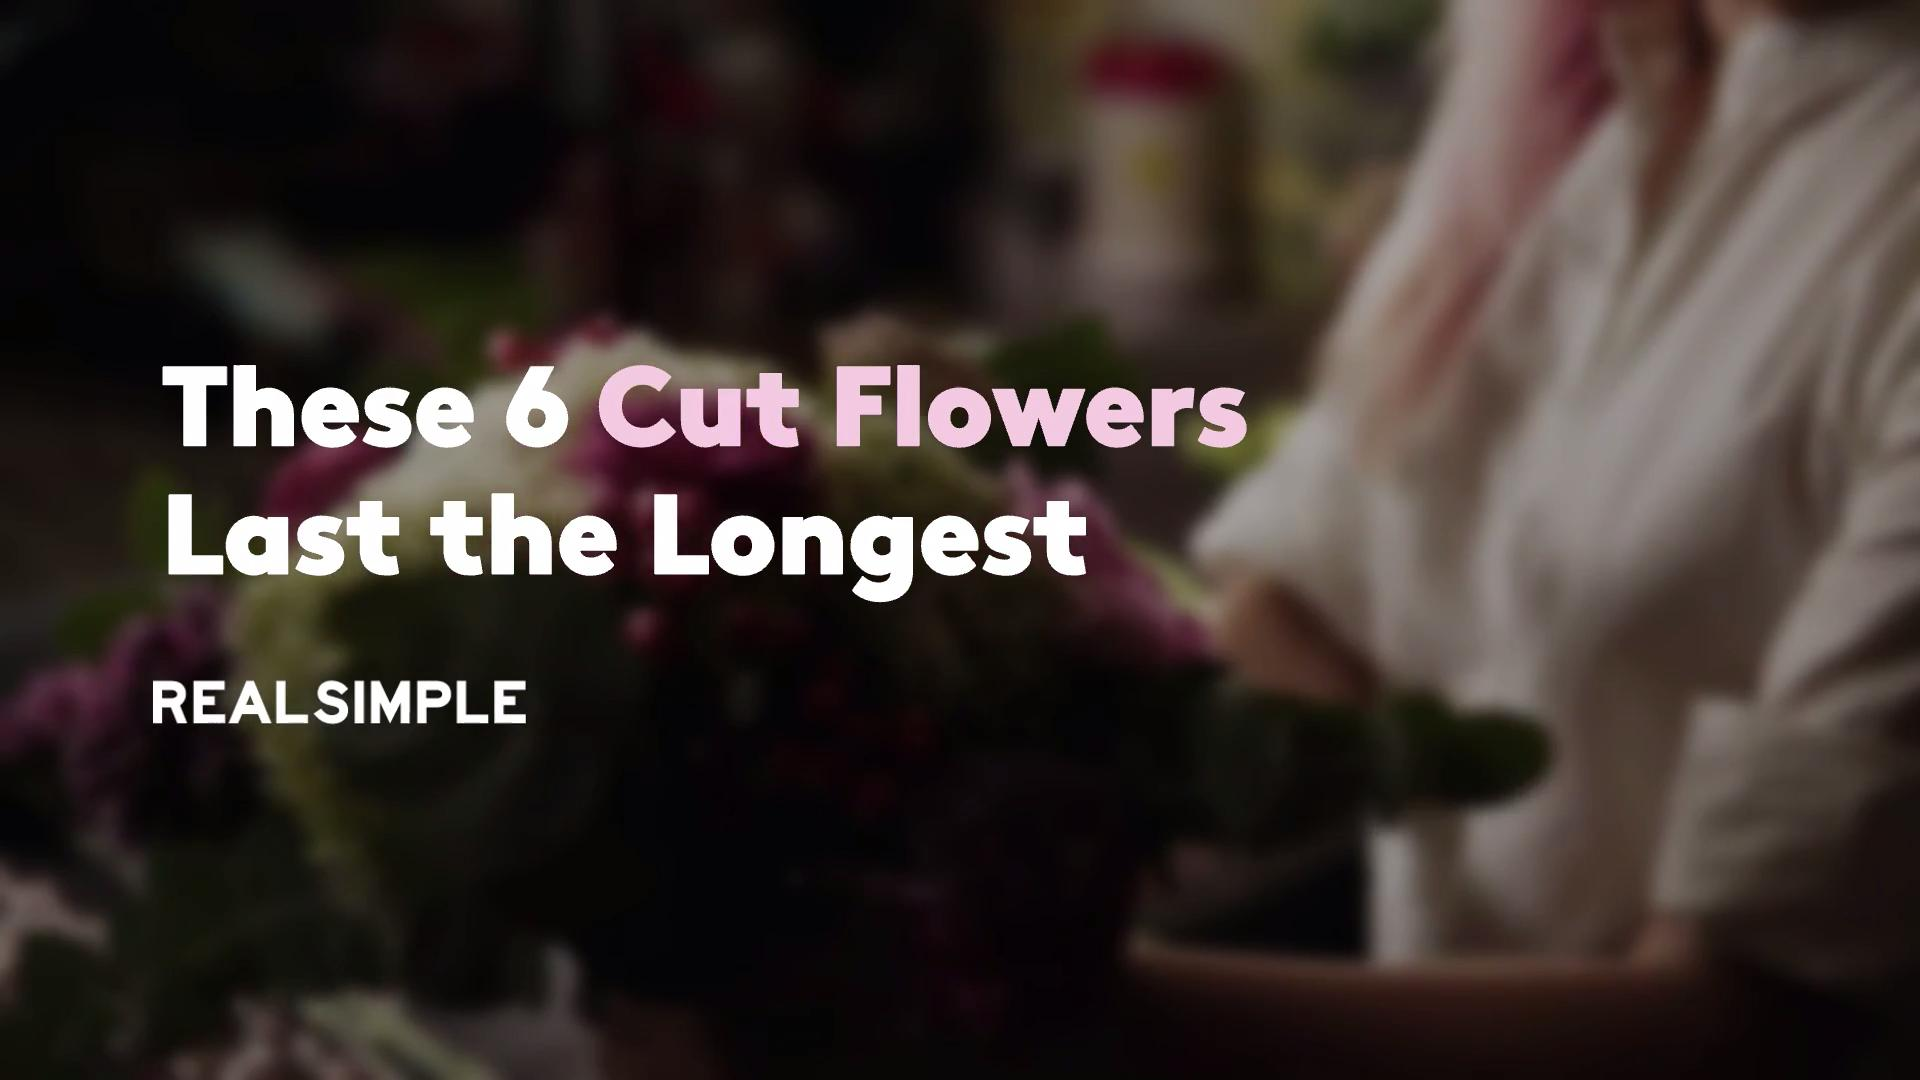 These 6 Cut Flowers Last the Longest